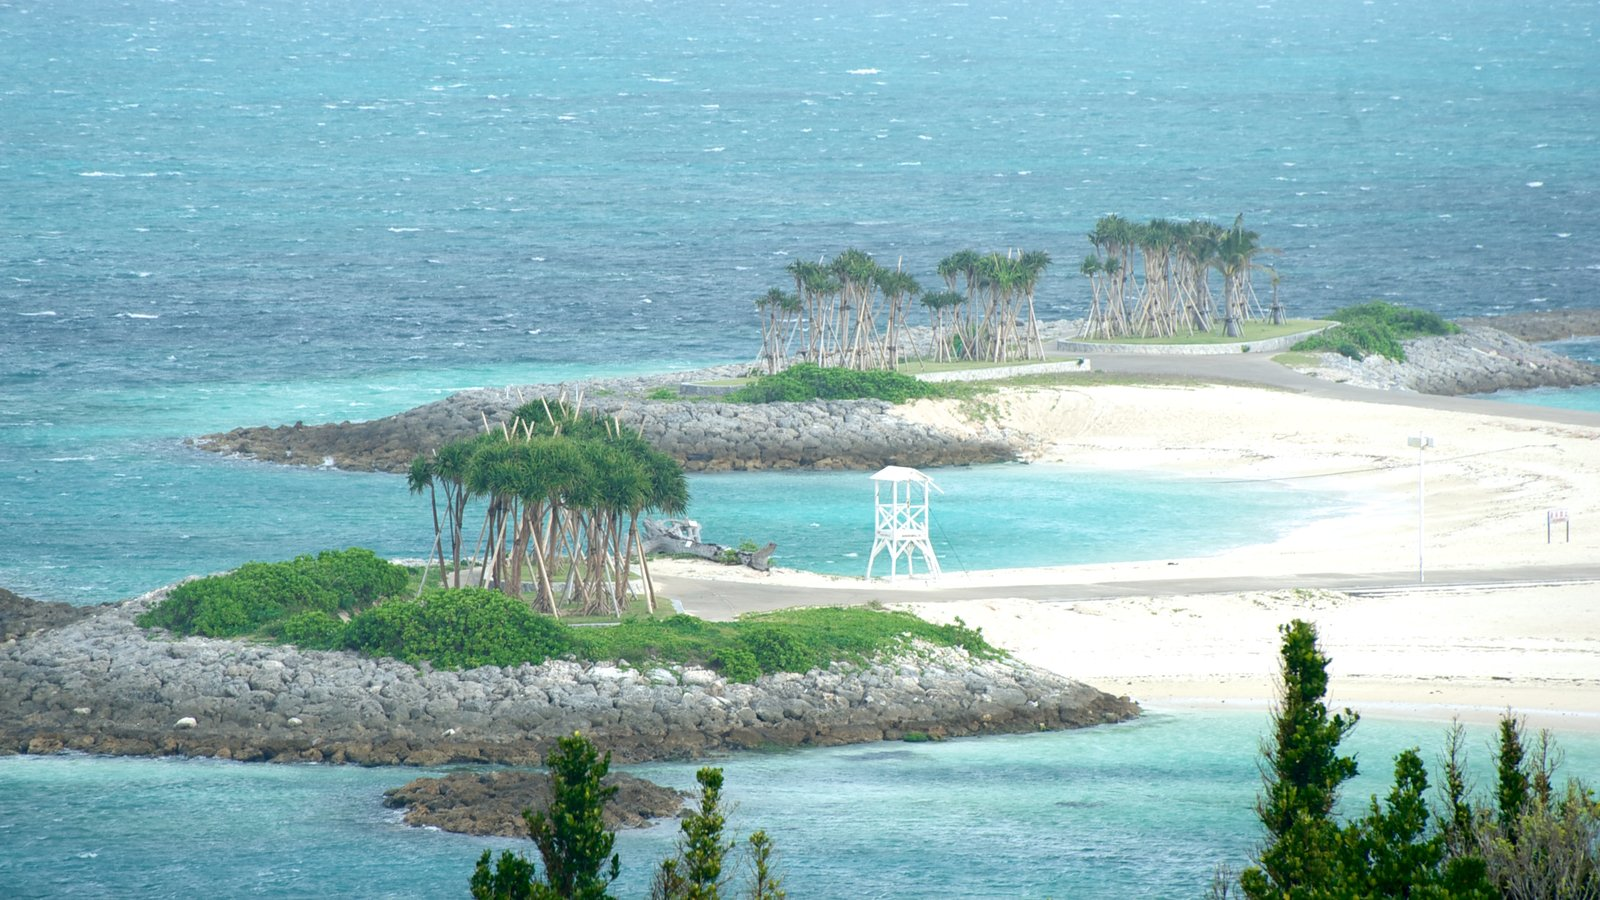 Okinawa Churaumi Aquarium which includes general coastal views and island images